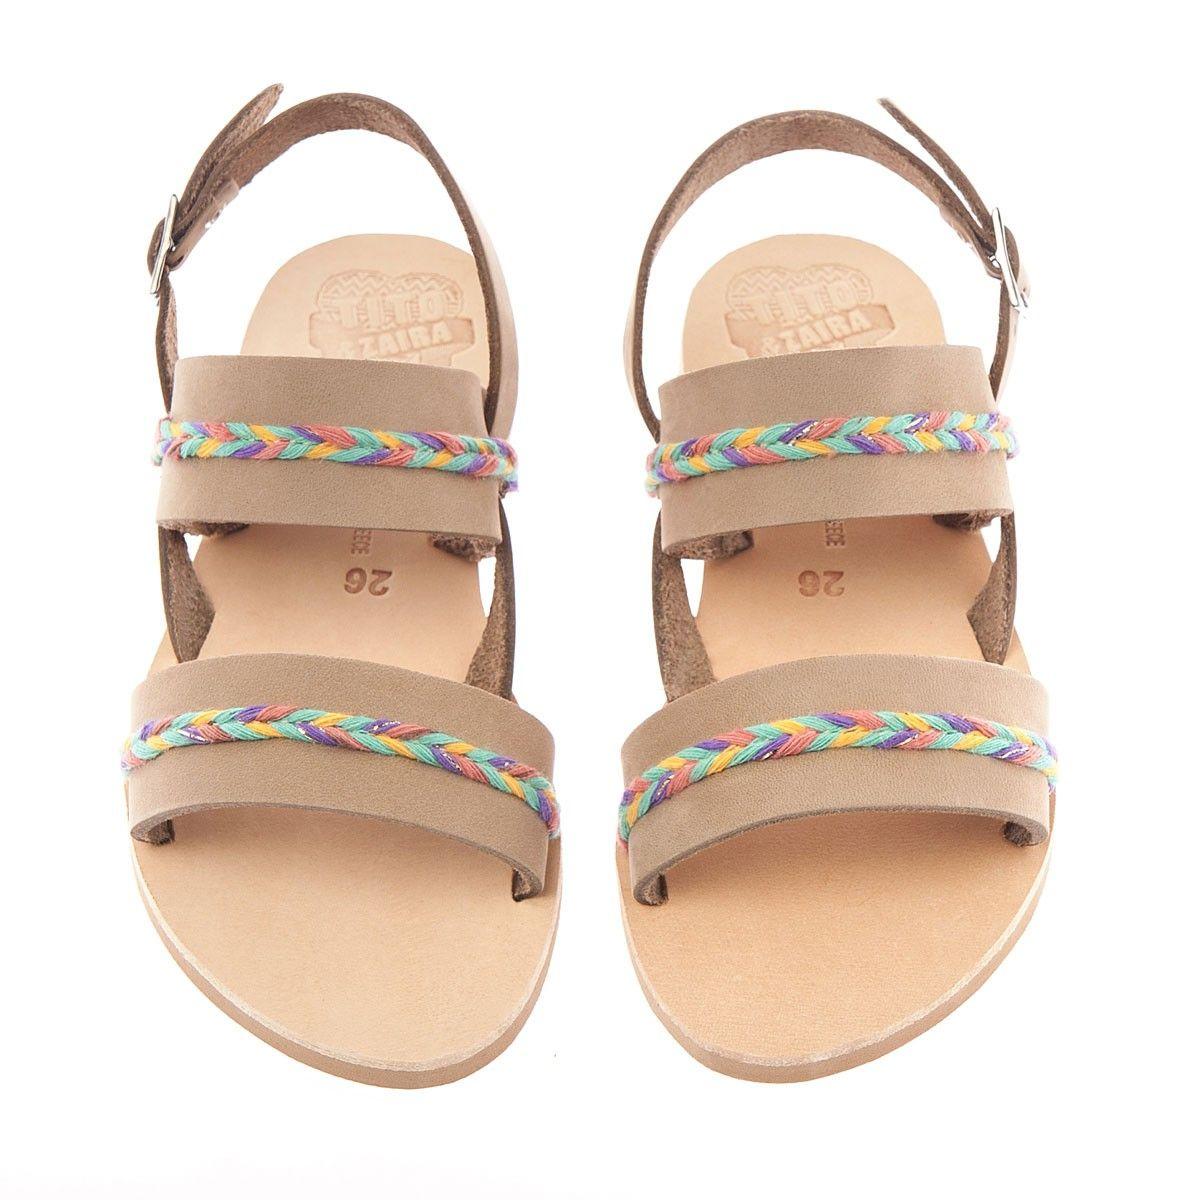 Kea Sandal - Tito & Zaira Sandals Online - Kids Webshop Goldfish.be - Kinderkleding en schoenen Goldfish Kids Web Store Mechelen